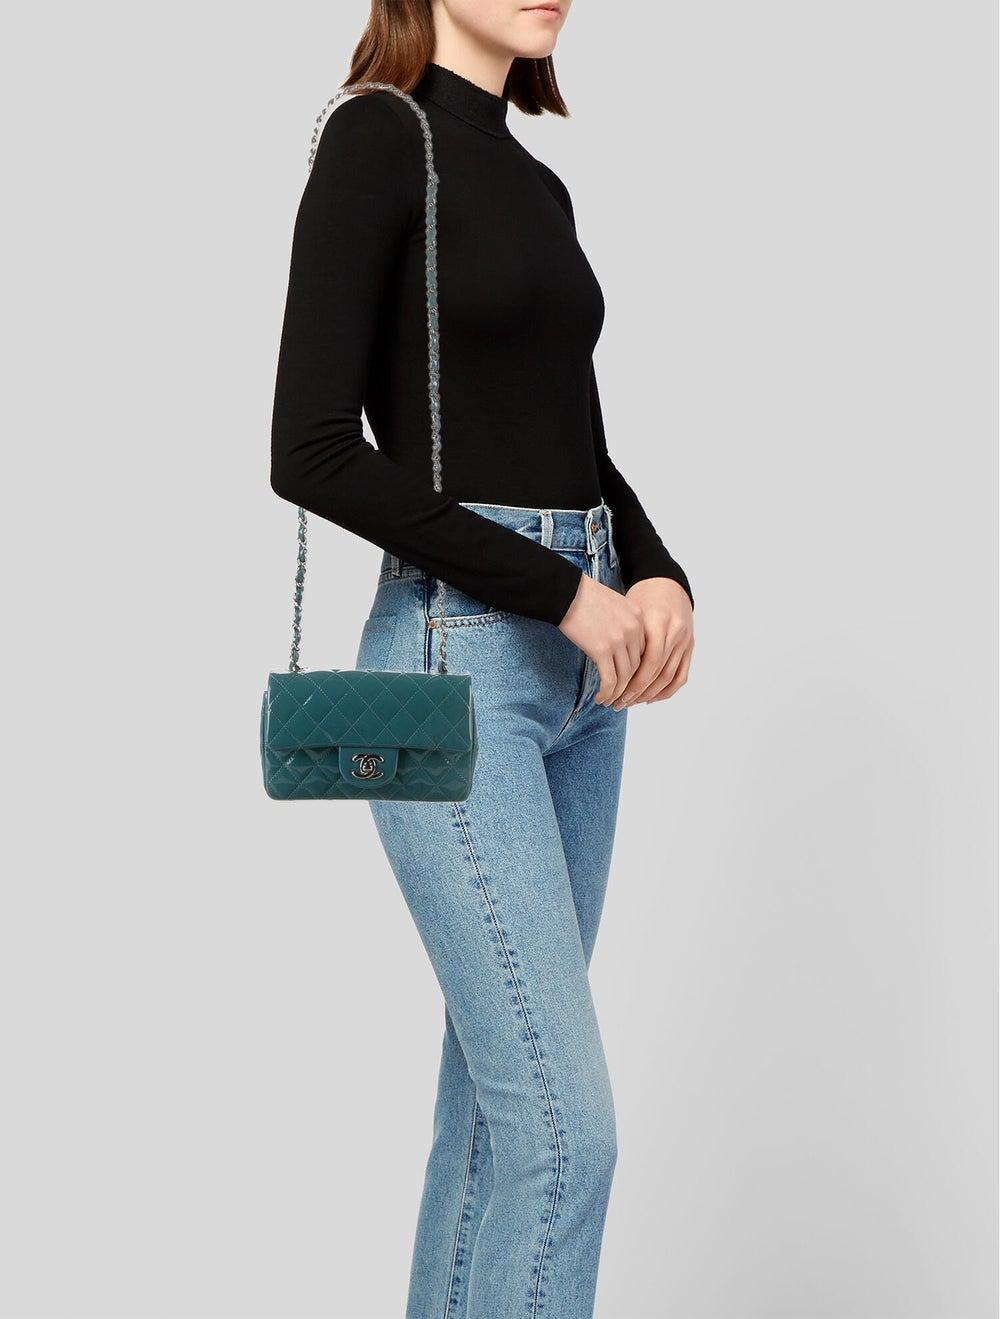 Chanel Classic Rectangular Mini Flap Bag Blue - image 2